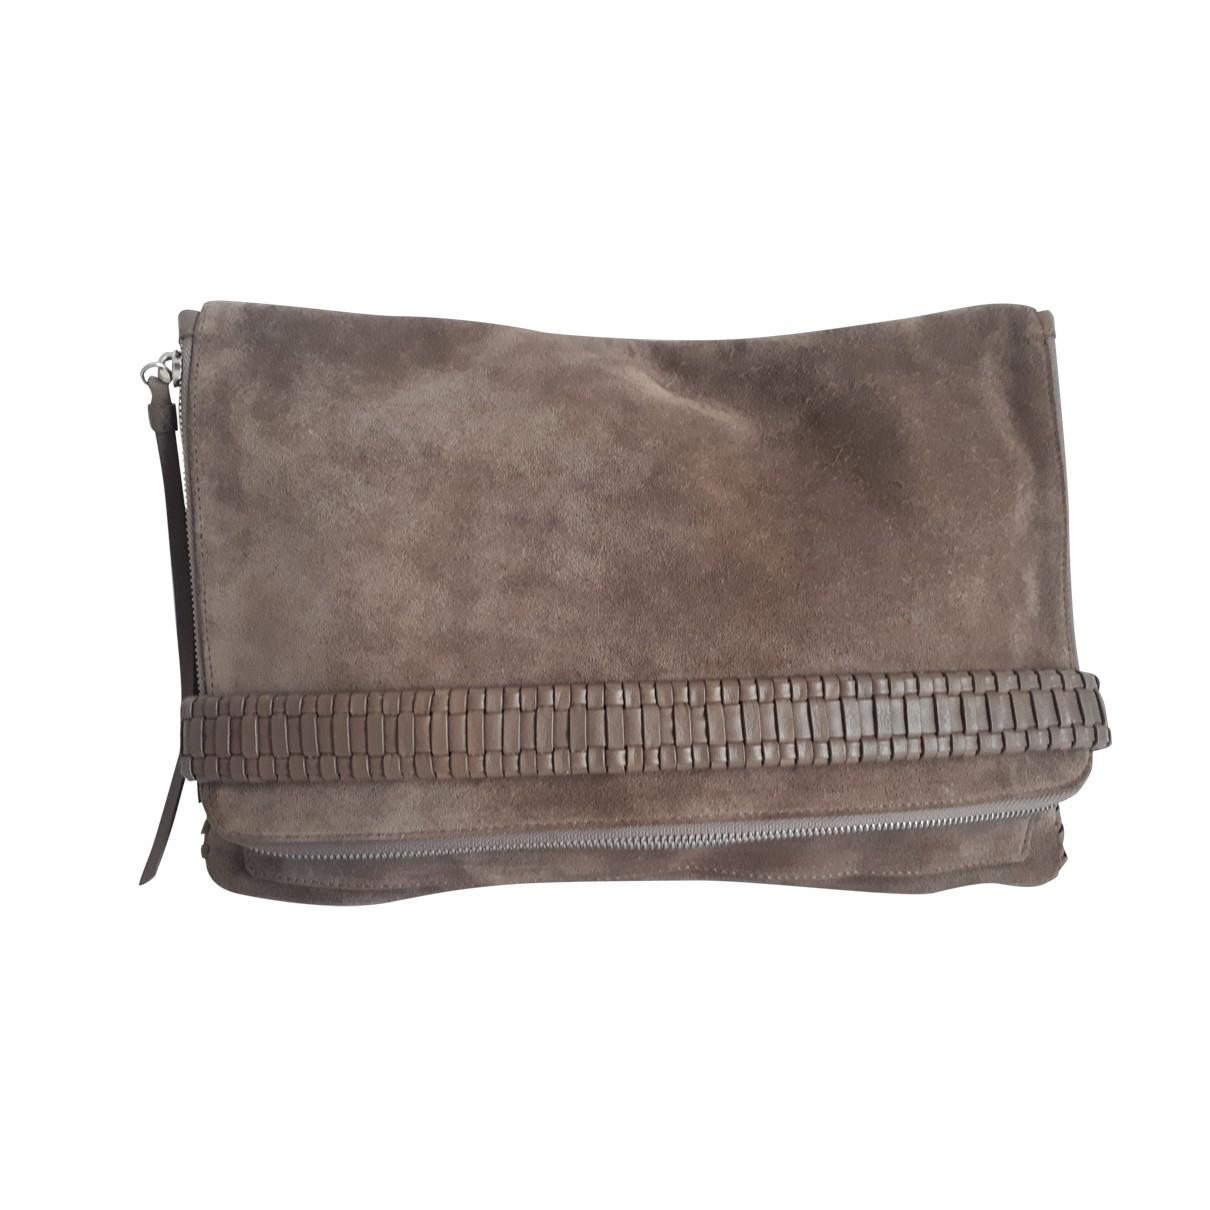 All Saints \N Grey Suede handbag for Women \N